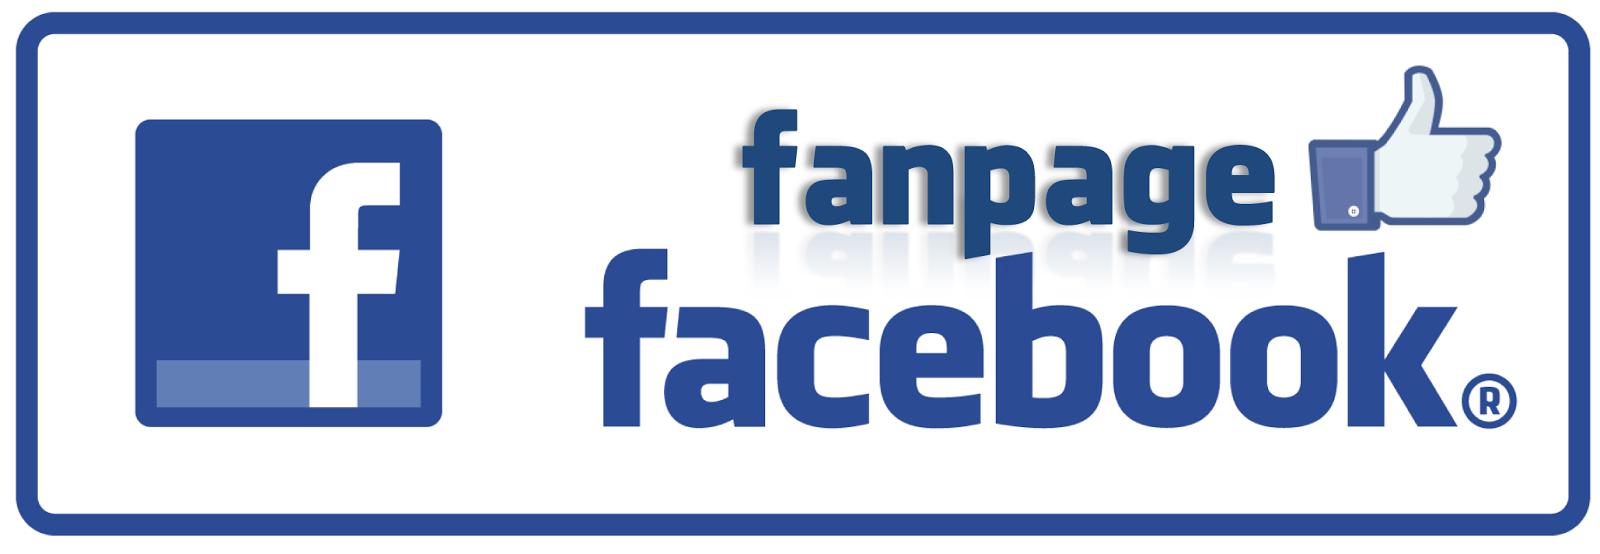 Mijn FB FanPage